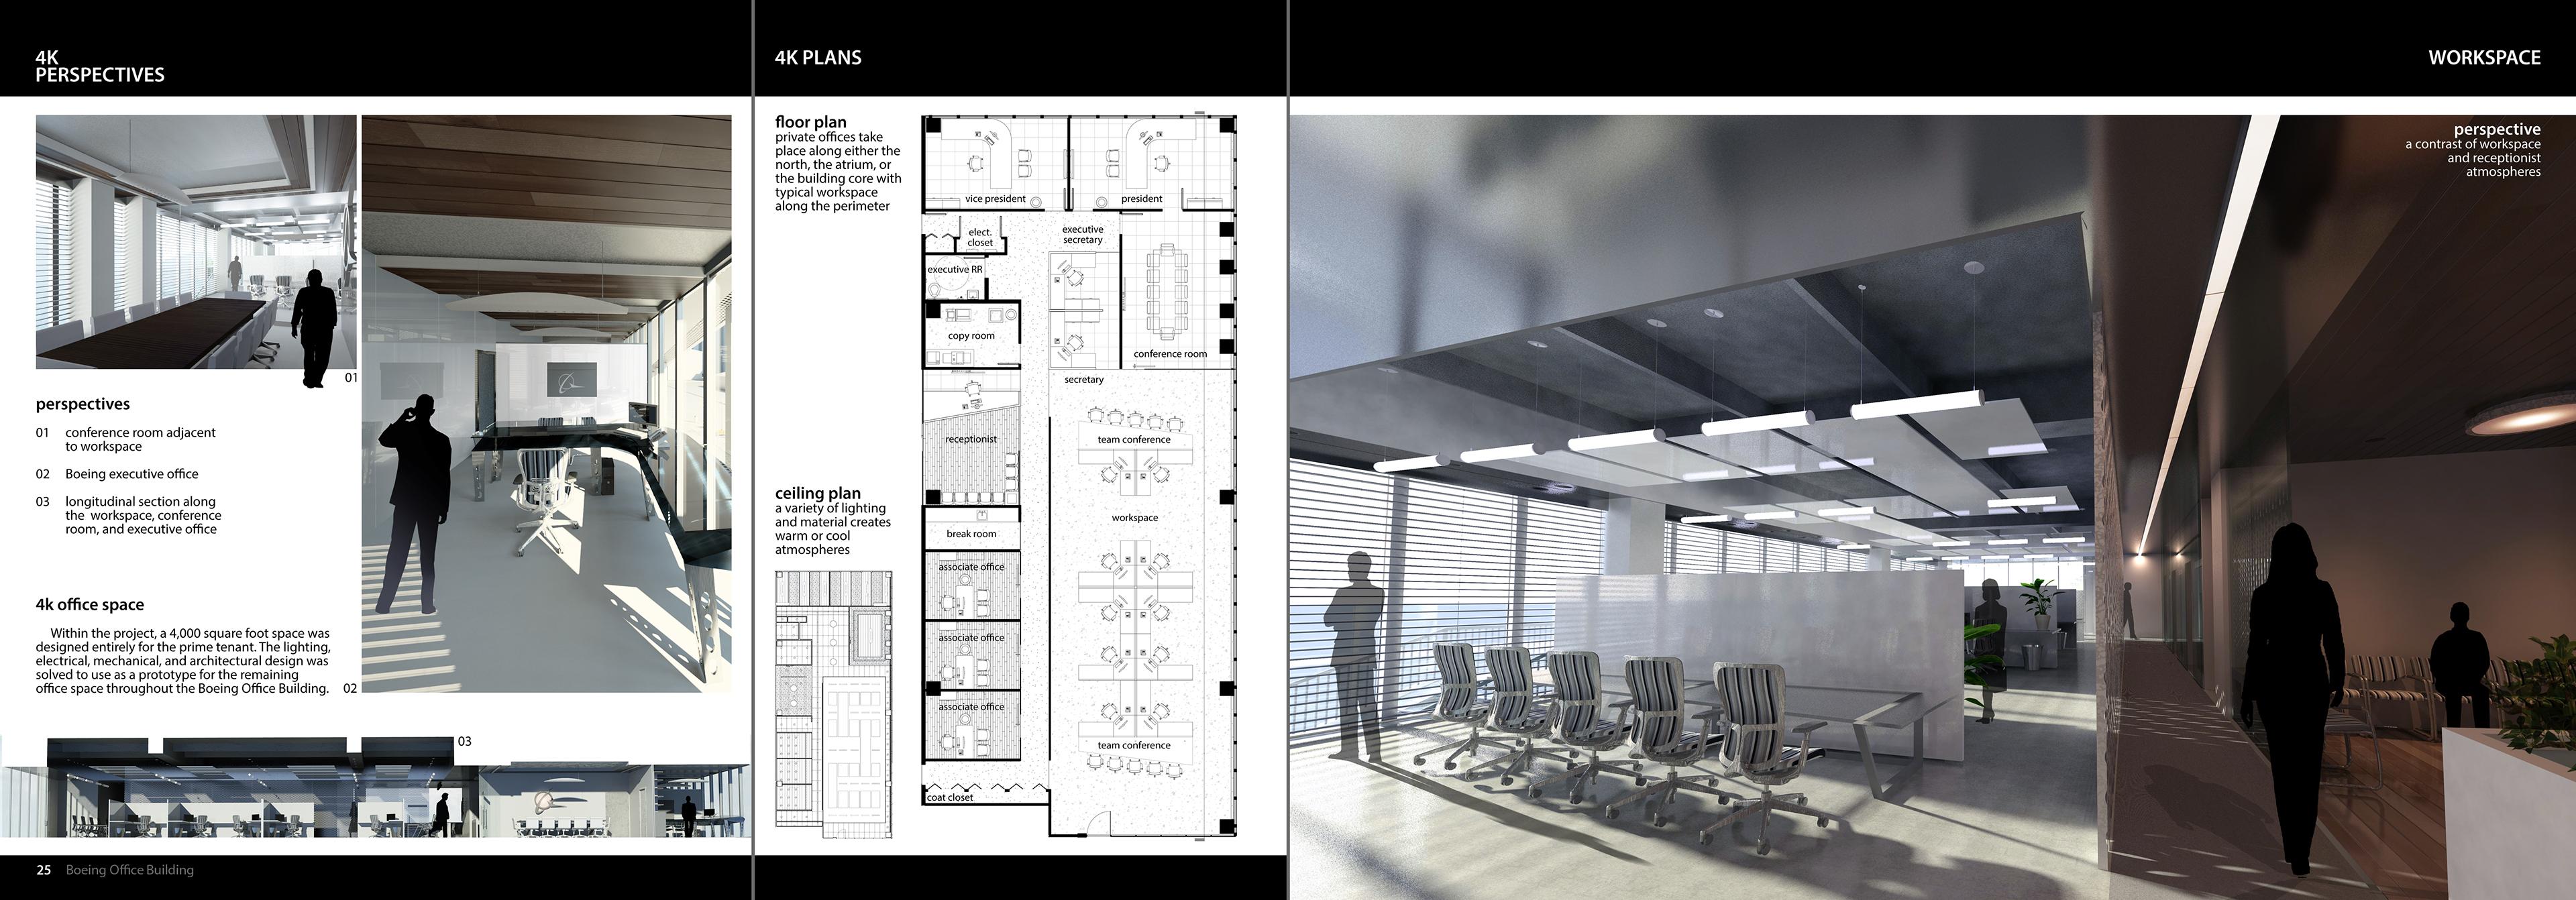 Portfolio architektur layout hw53 startupjobsfa for Portfolio architektur